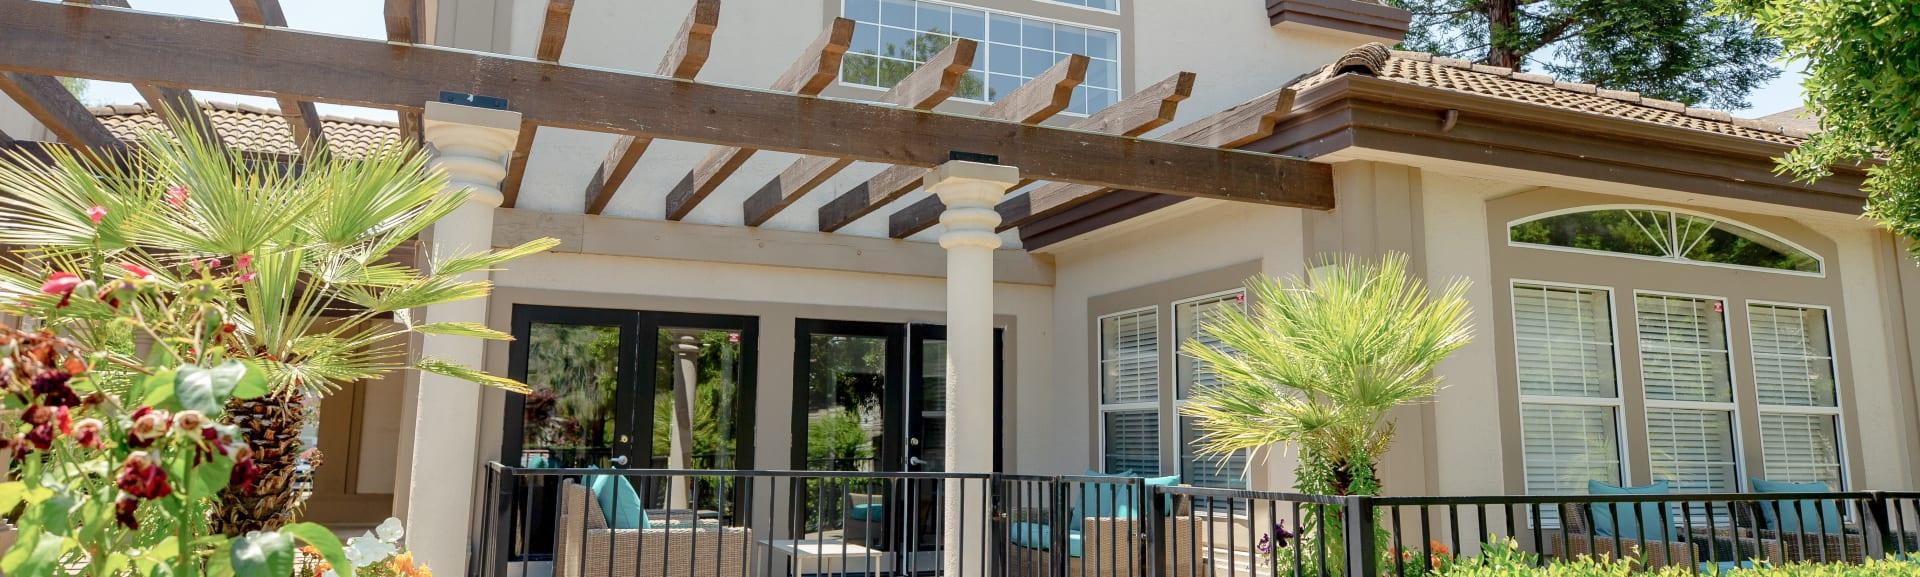 View amenities at Shaliko in Rocklin, California.